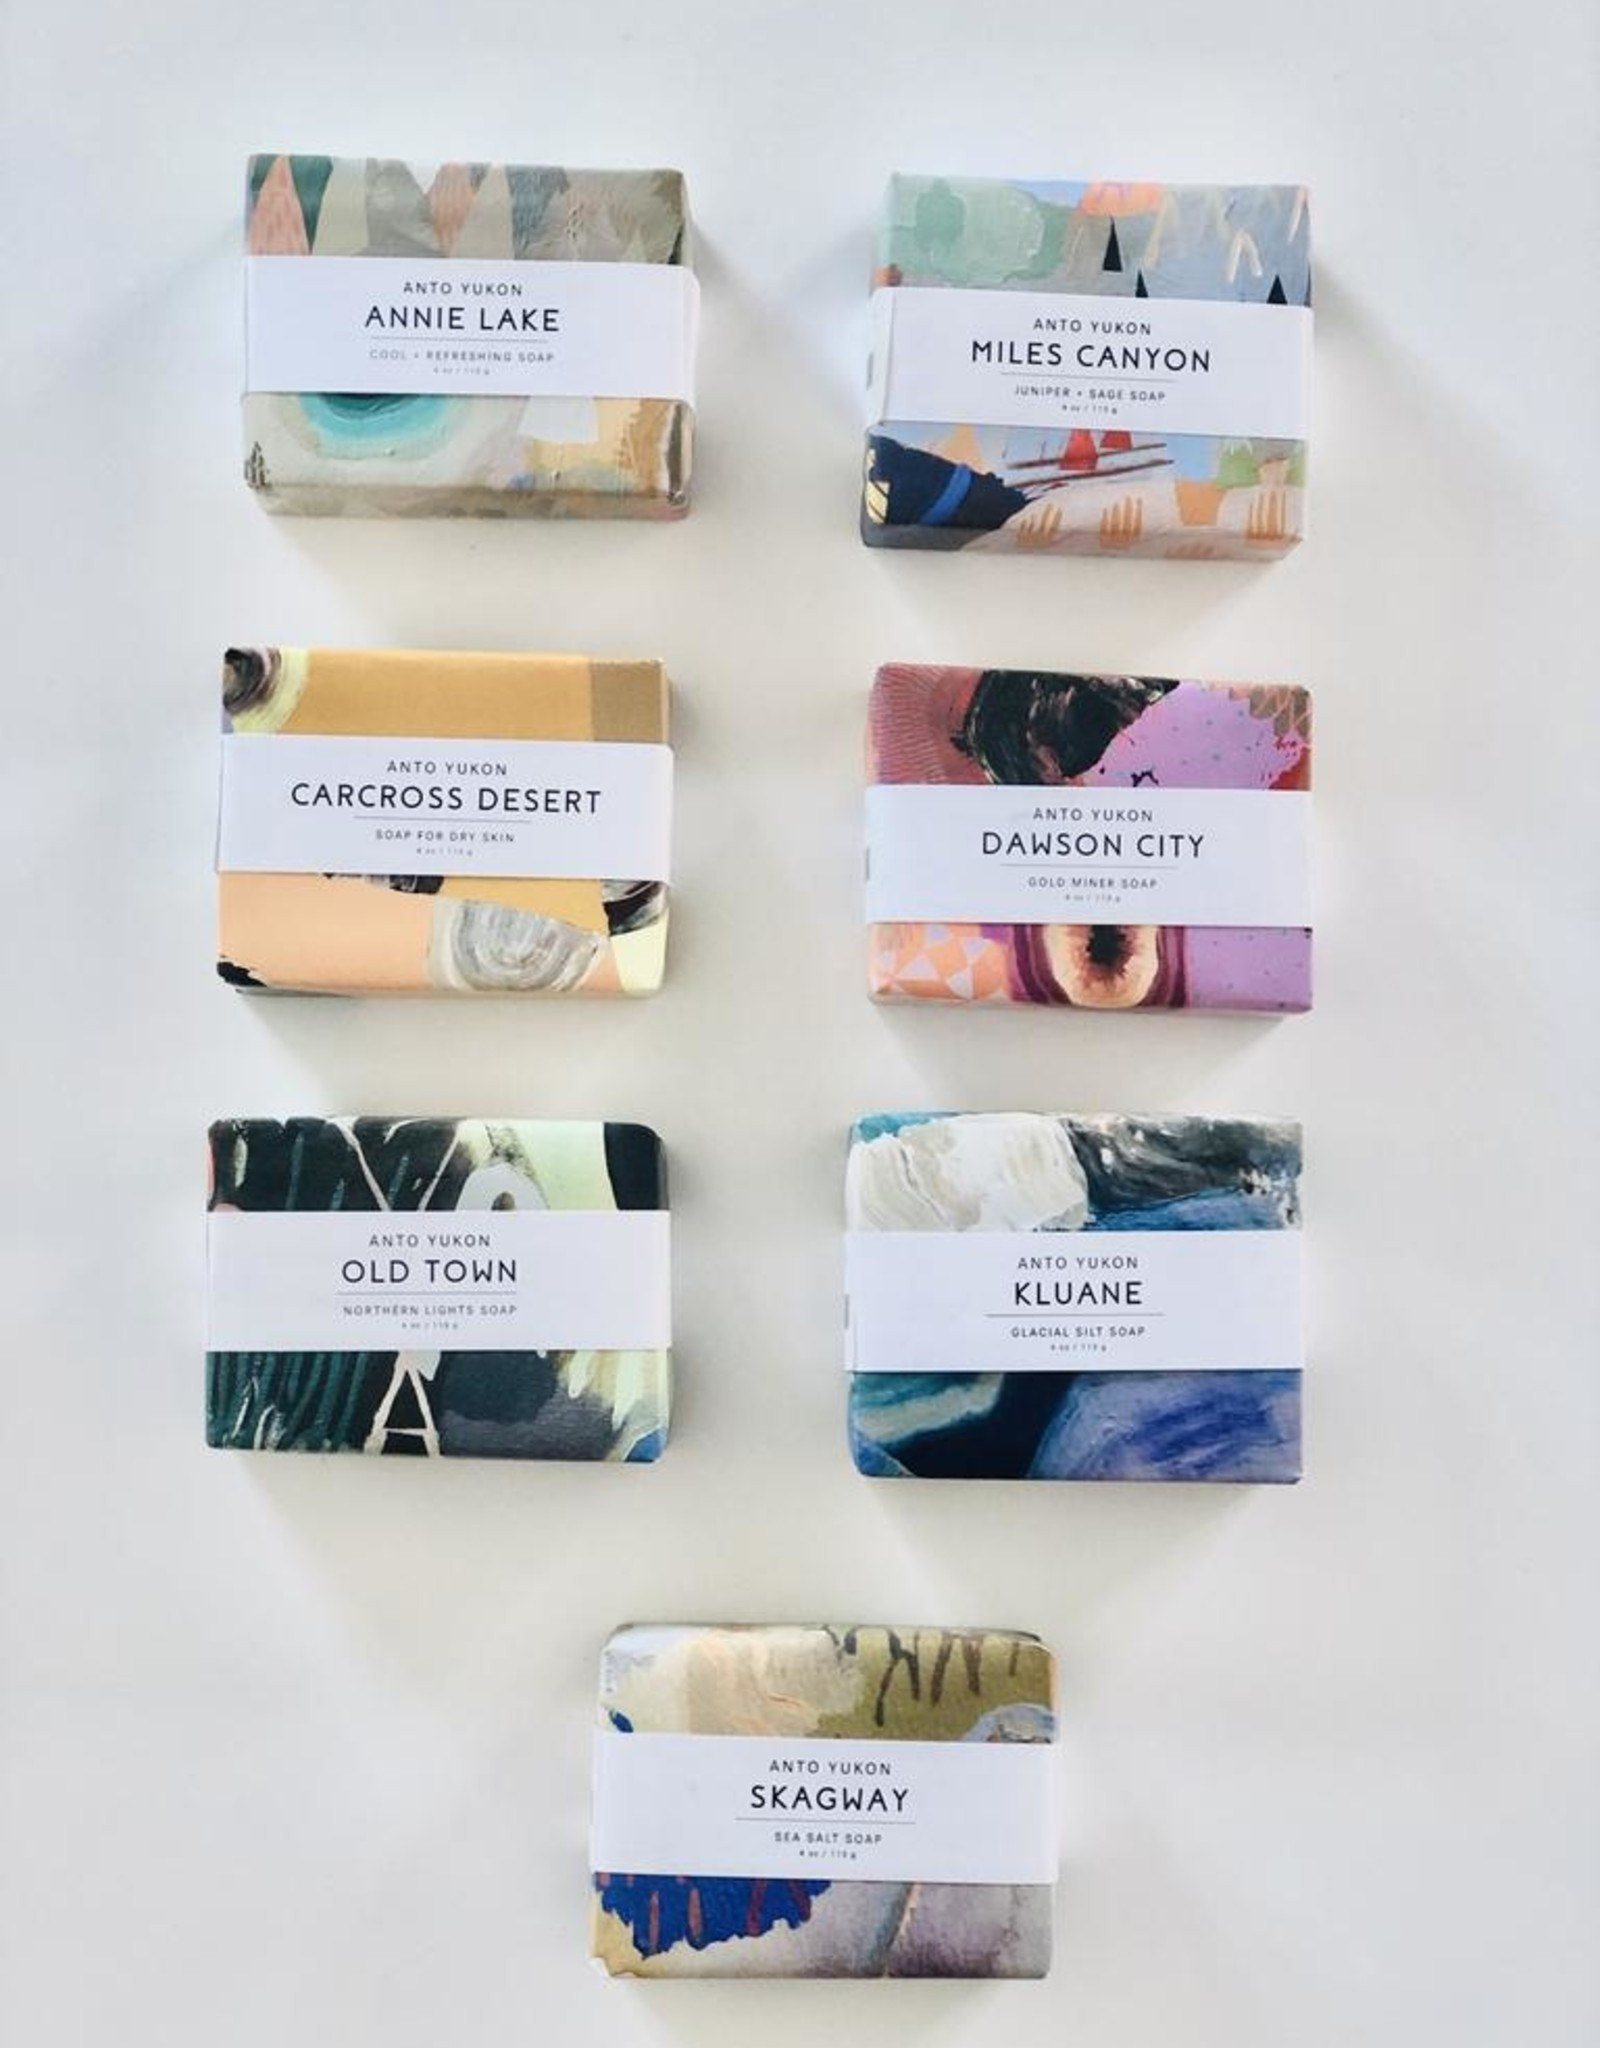 Anto Handmade Soap Annie Lake